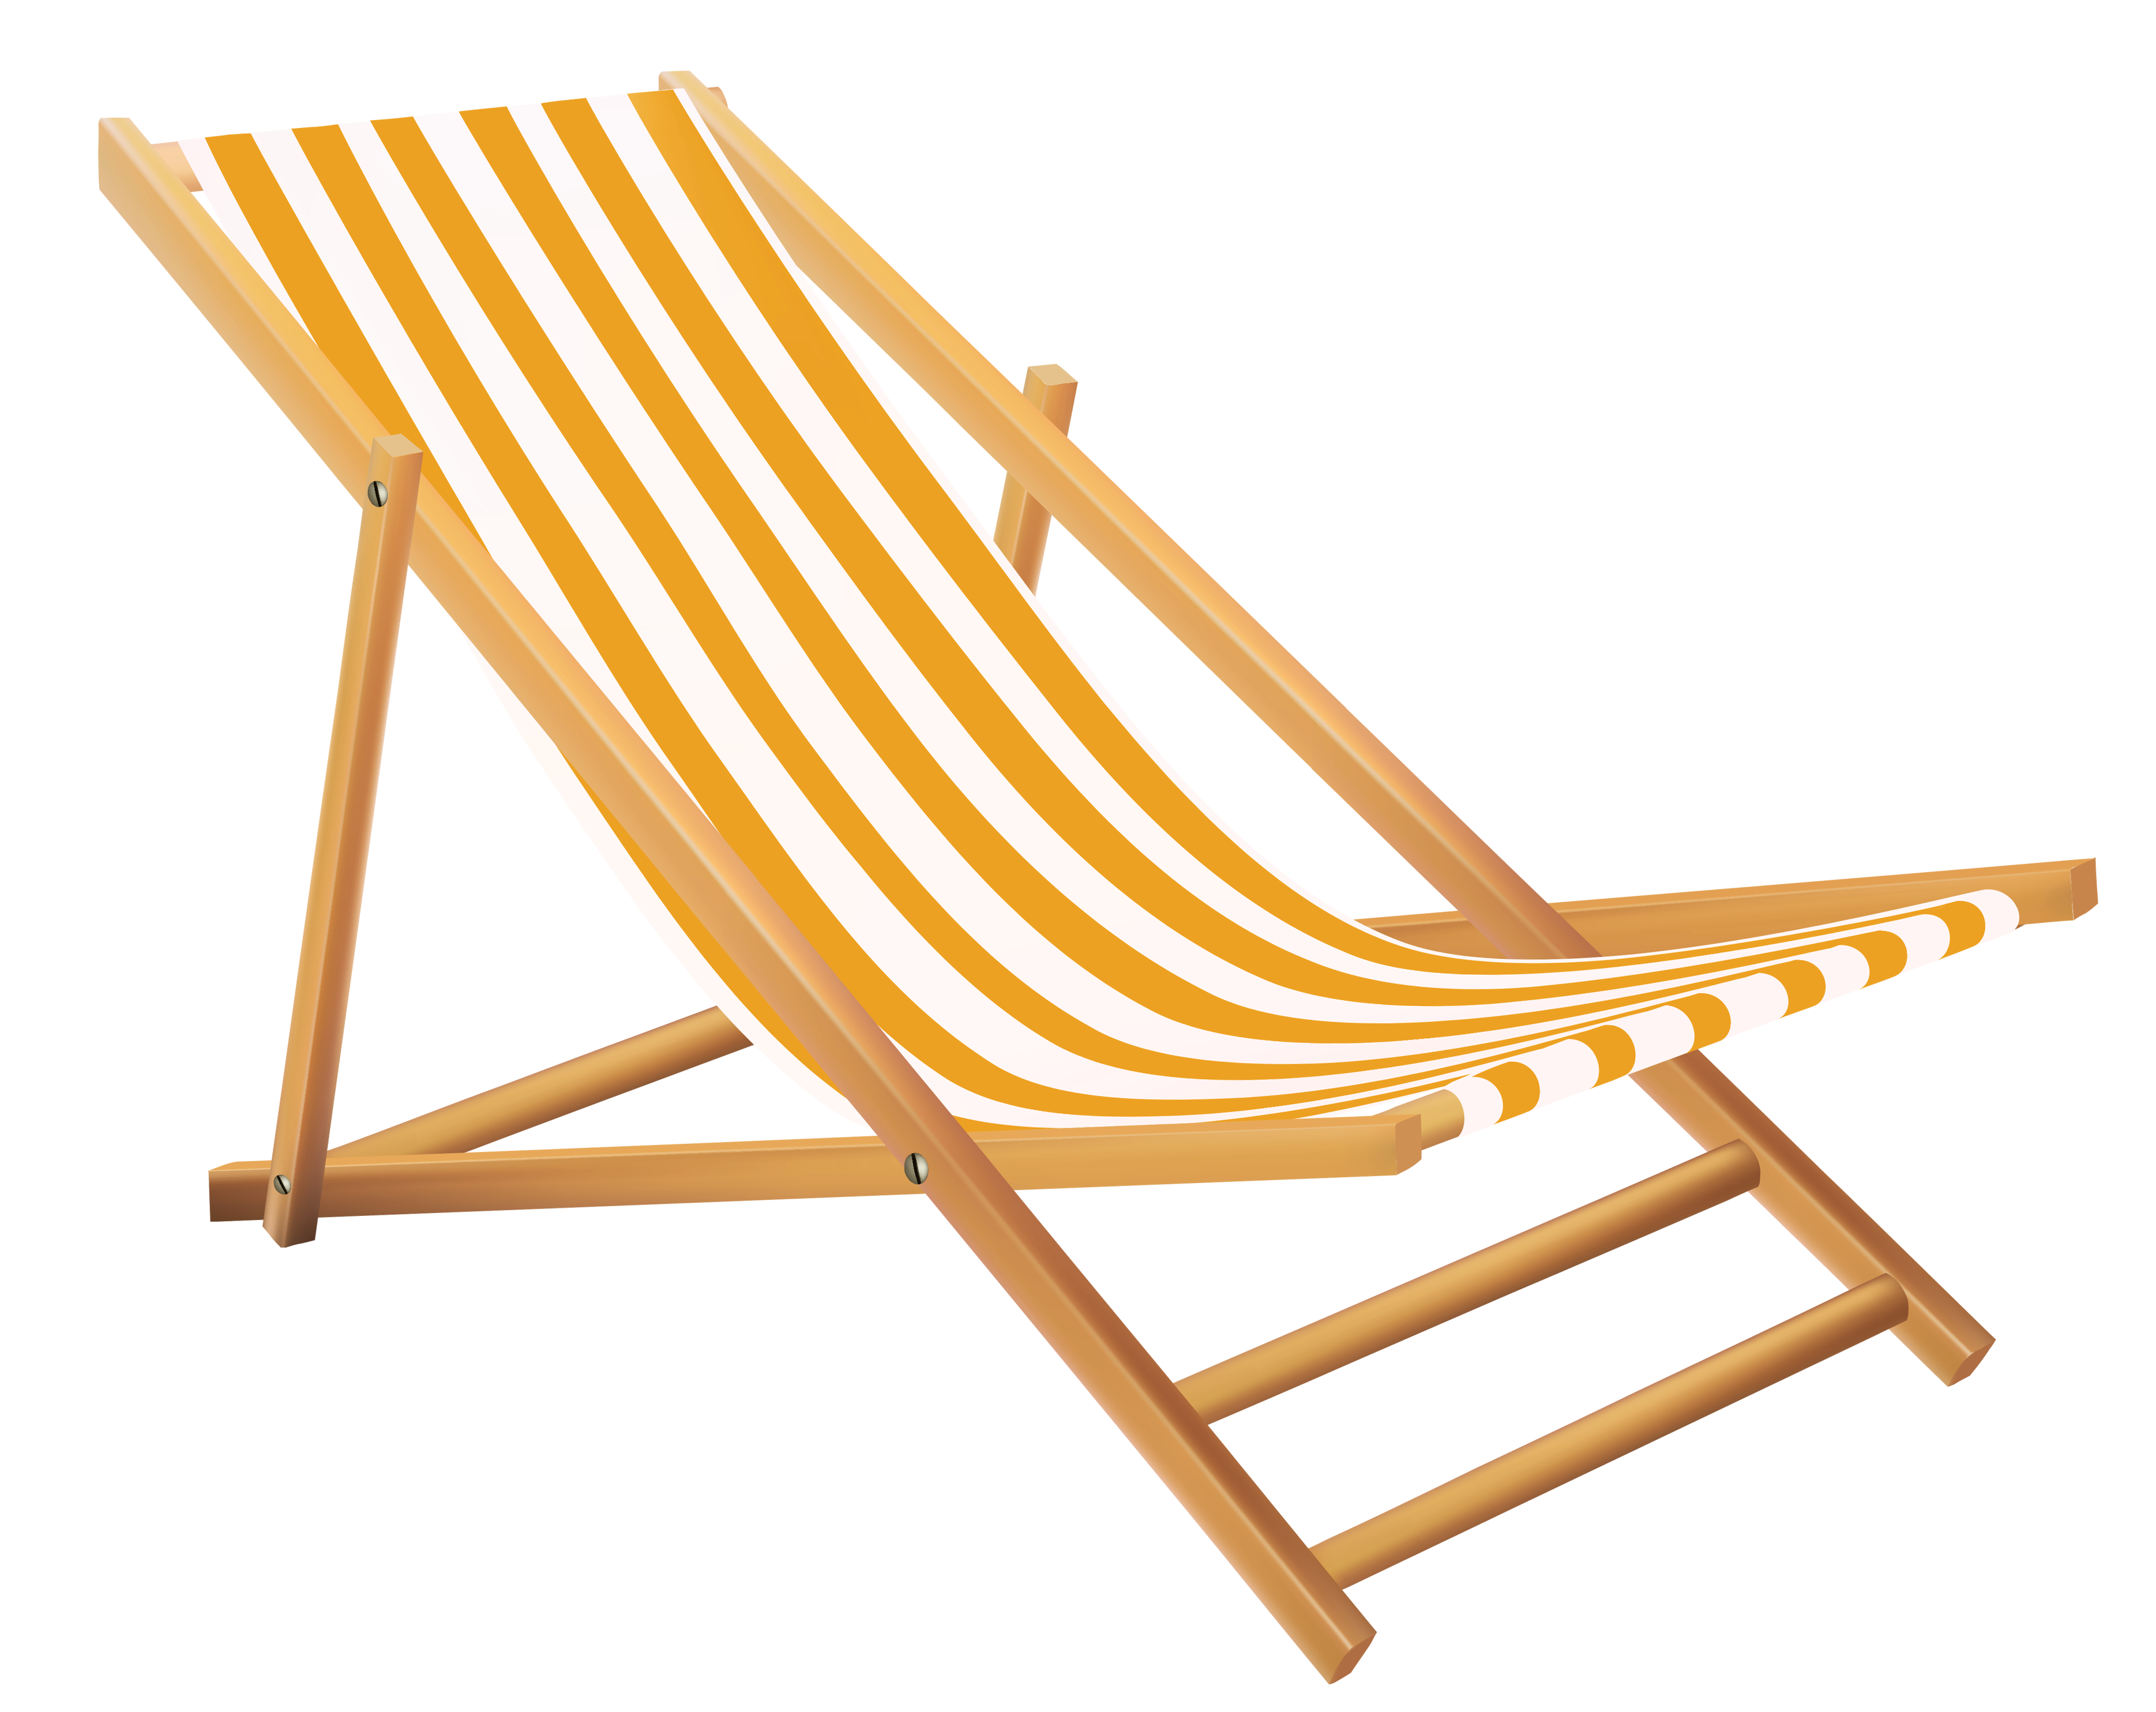 Free Beach Chair Transparent, Download Free Clip Art, Free.